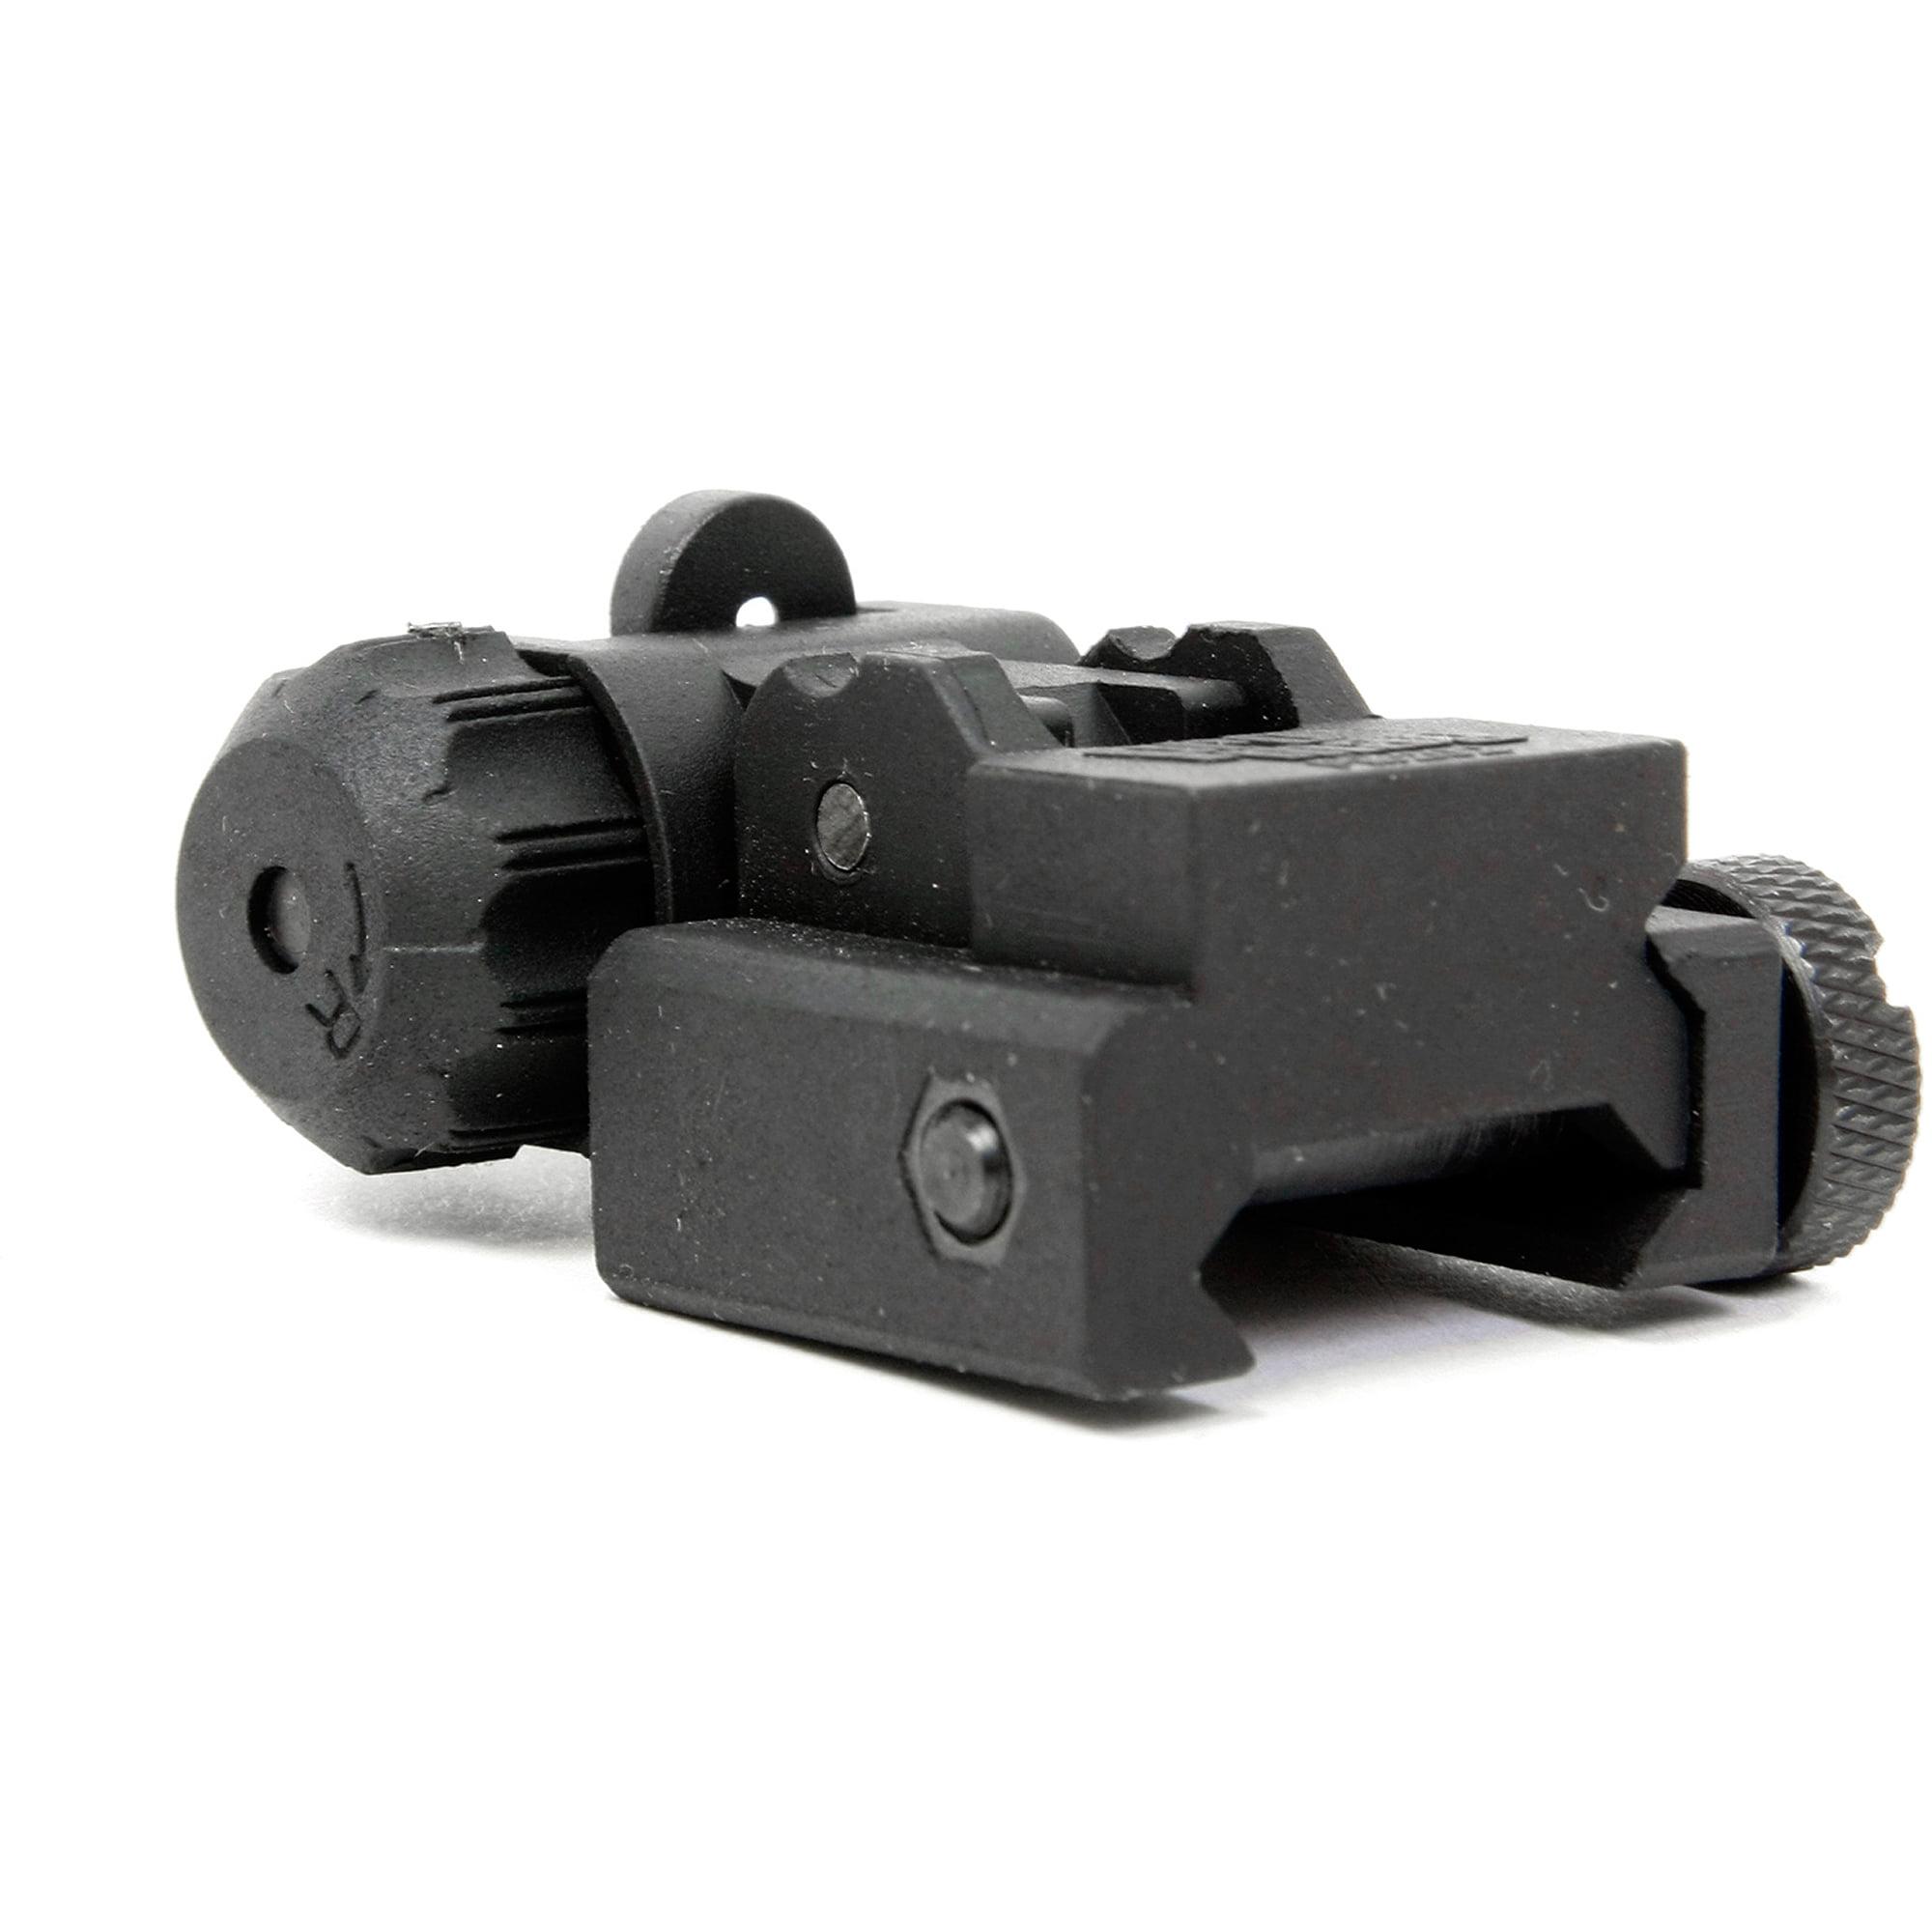 ProMag AR15 Flip Up A2 Dual Aperture Rear Sight Blk Polymer